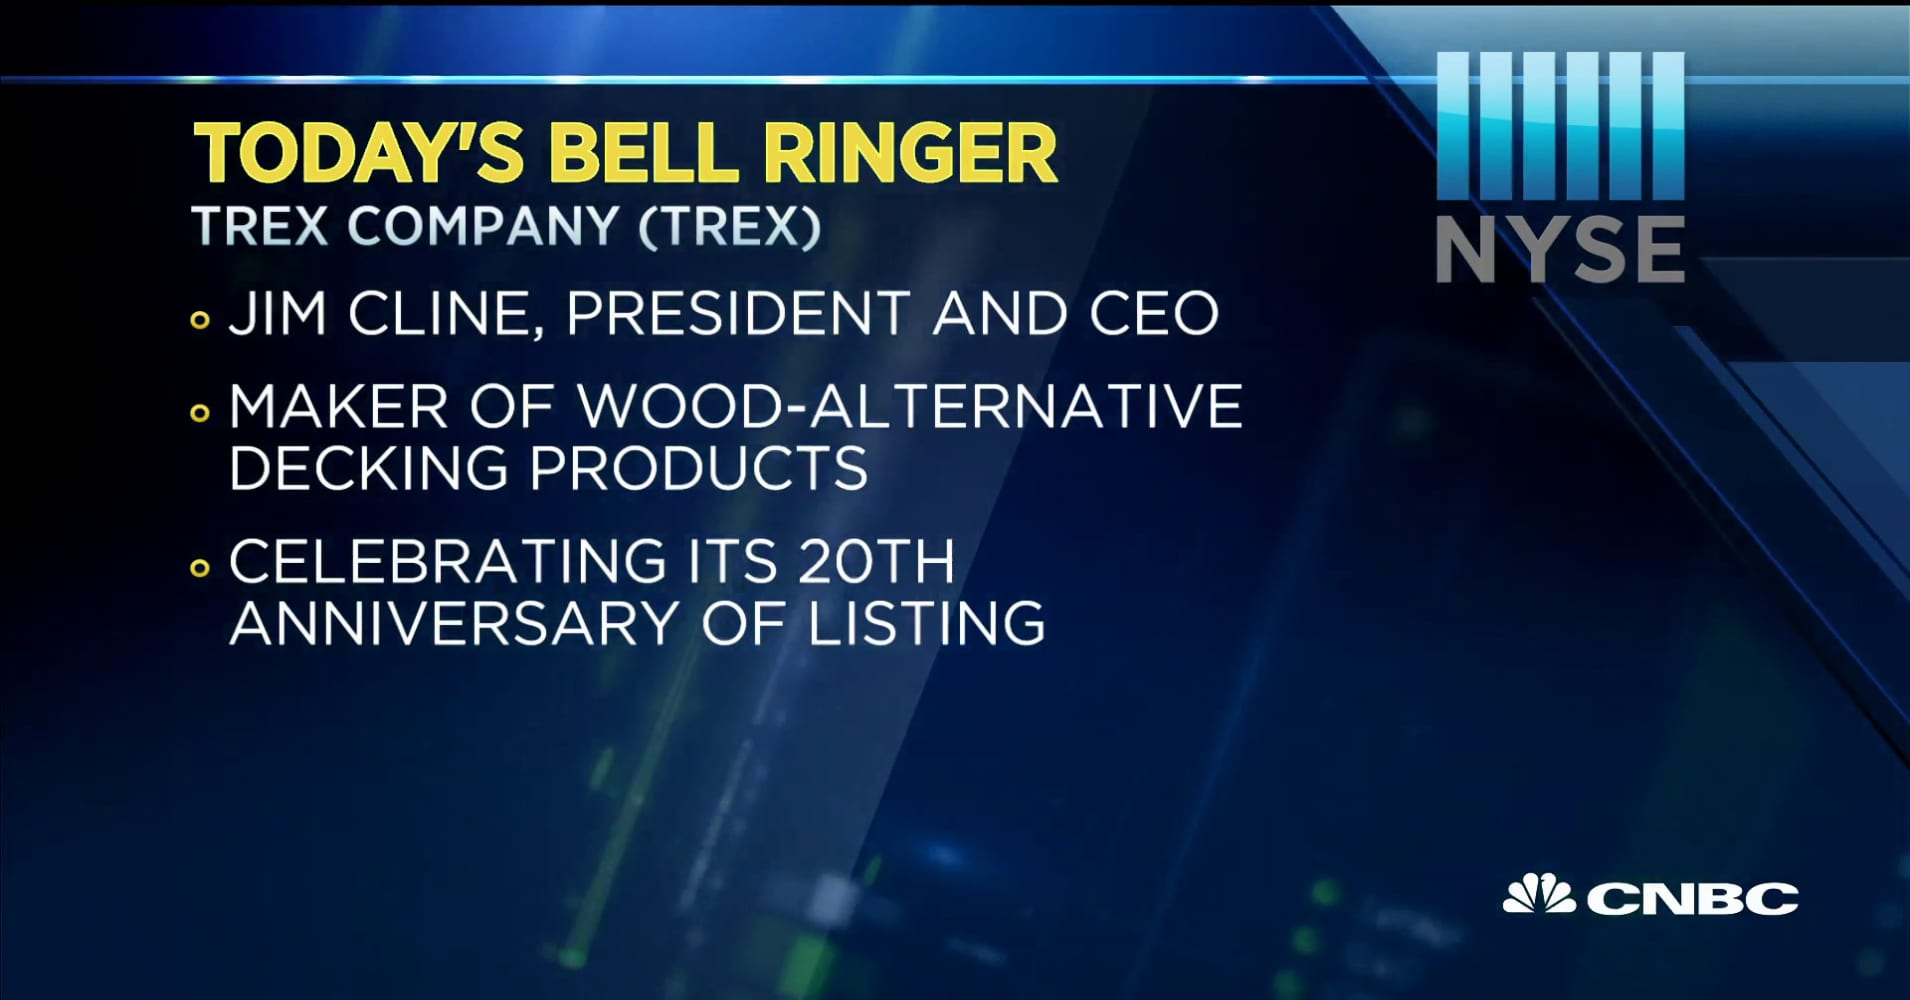 Today's Bell Ringer, April 8, 2019